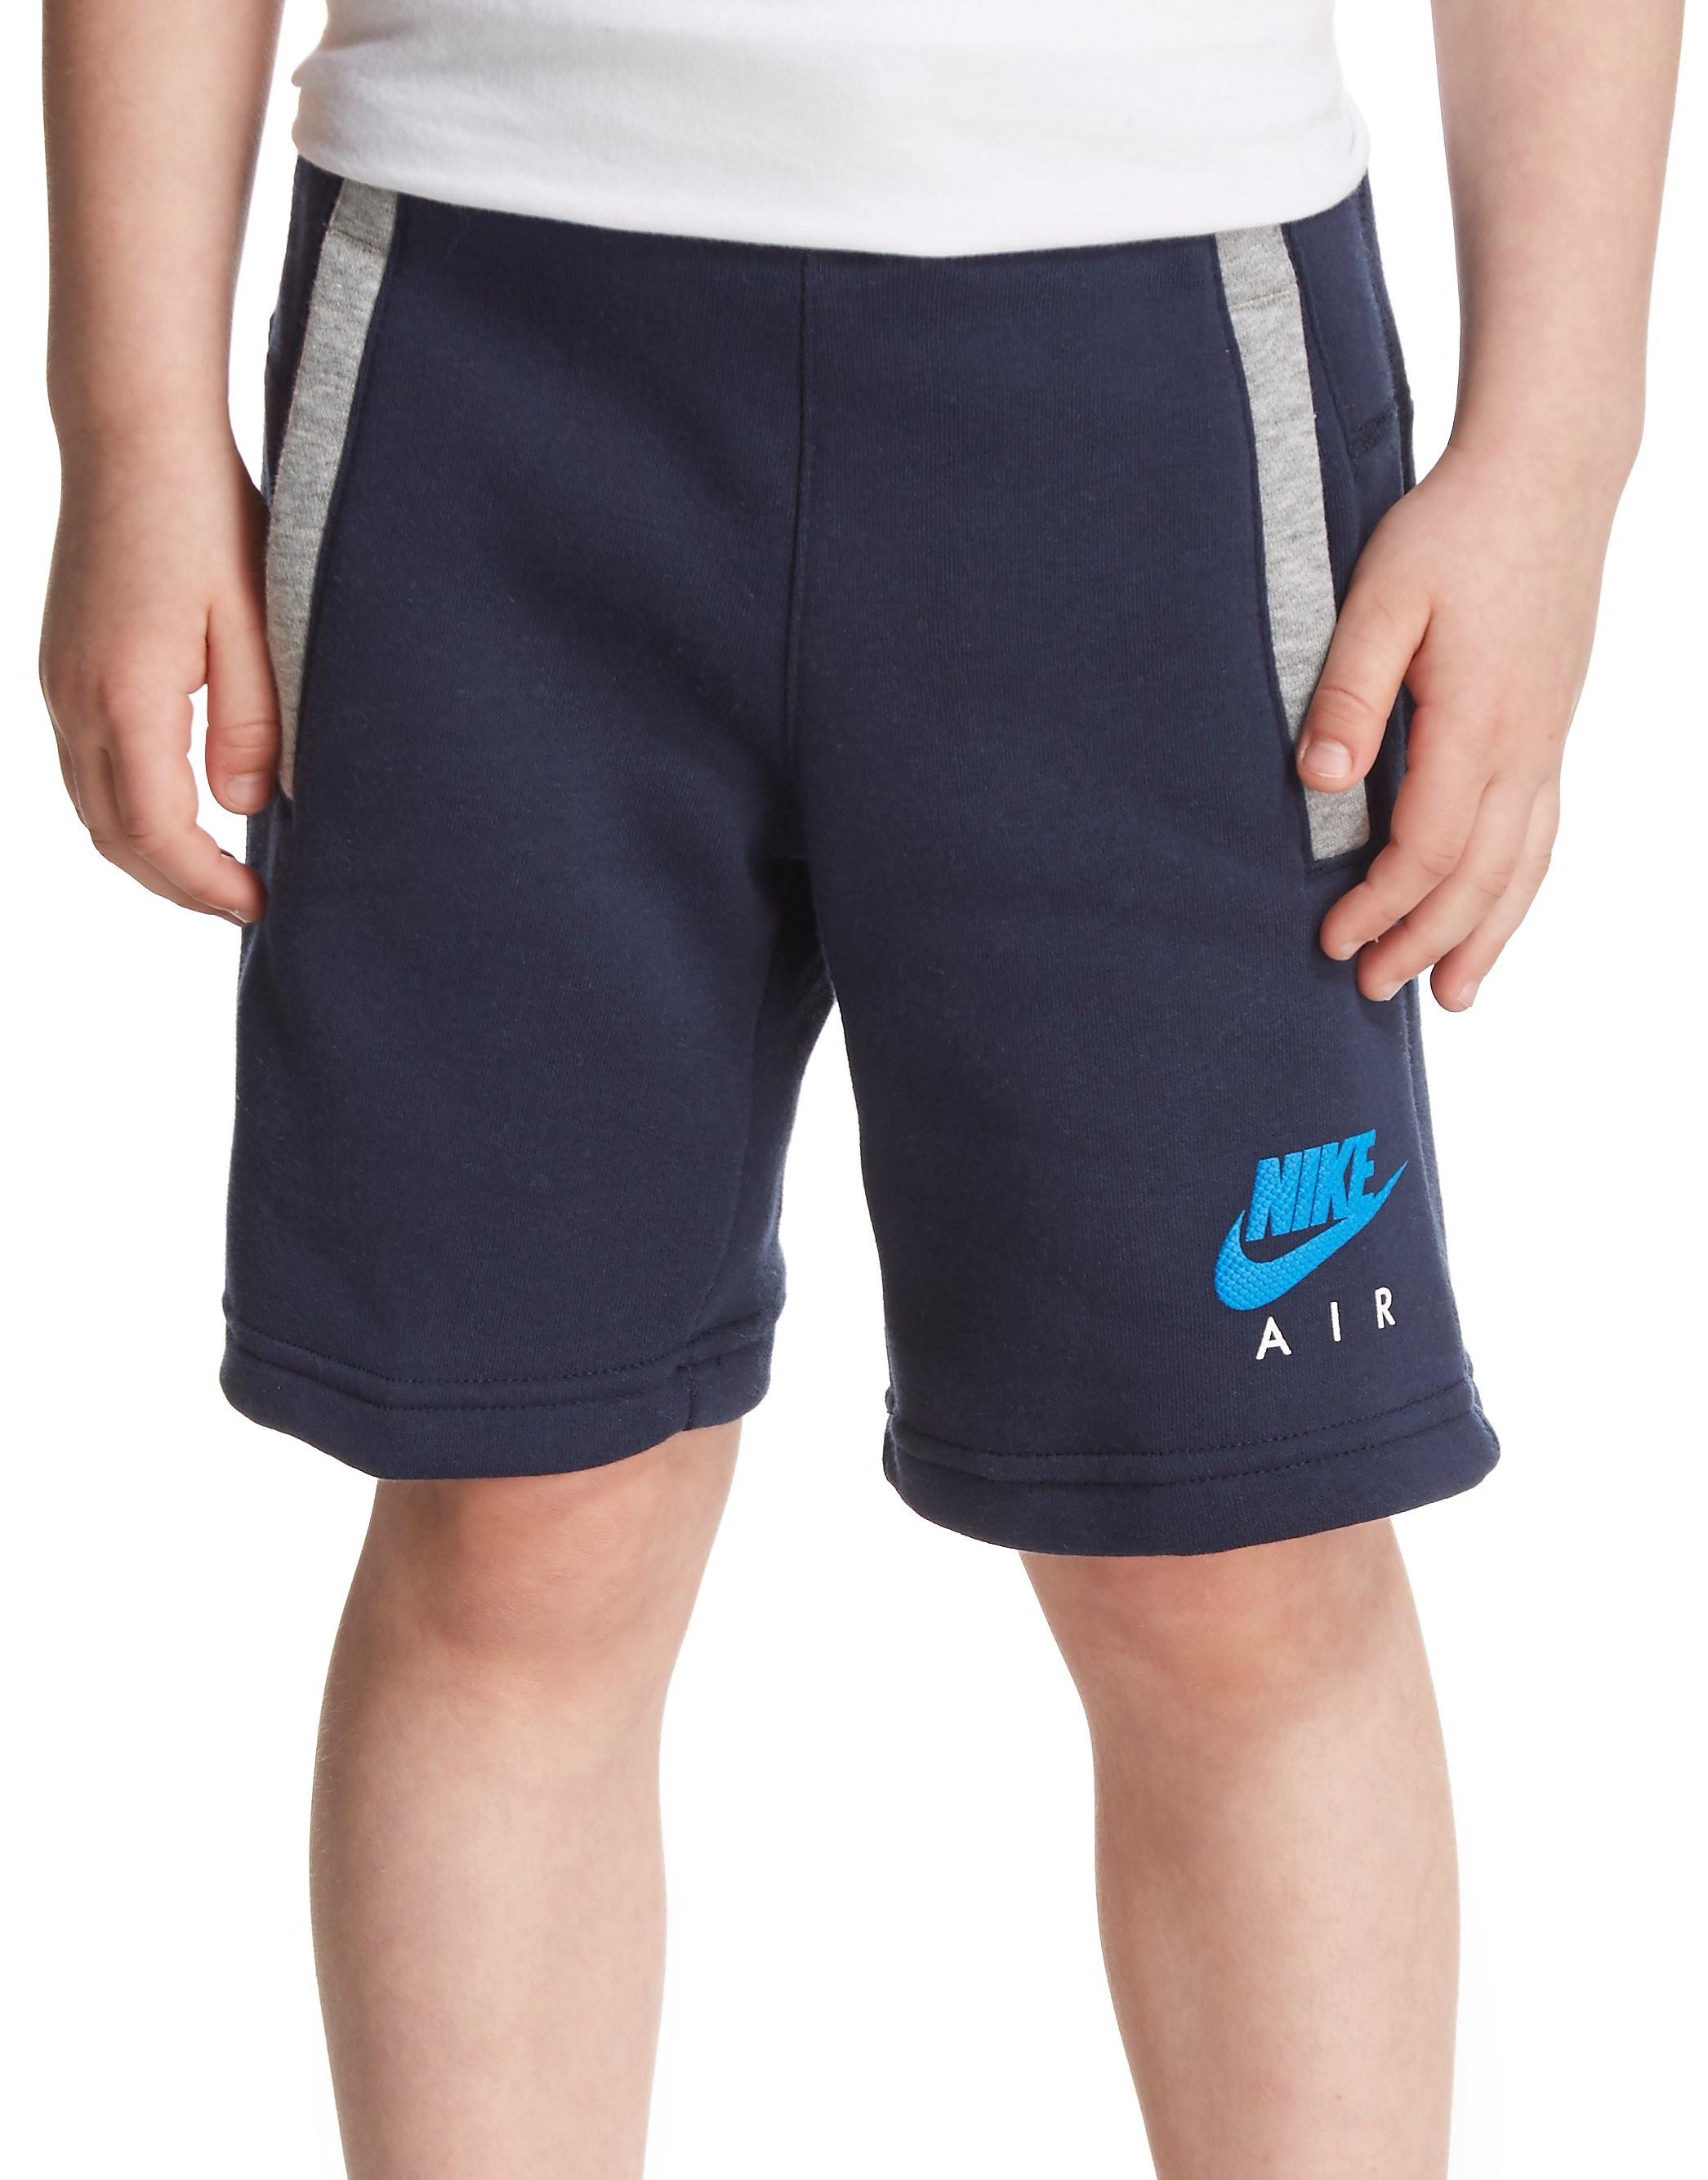 862e05e59d9e Nike Air Fleece Shorts Children - Navy Blue - Kids - Sports King Store